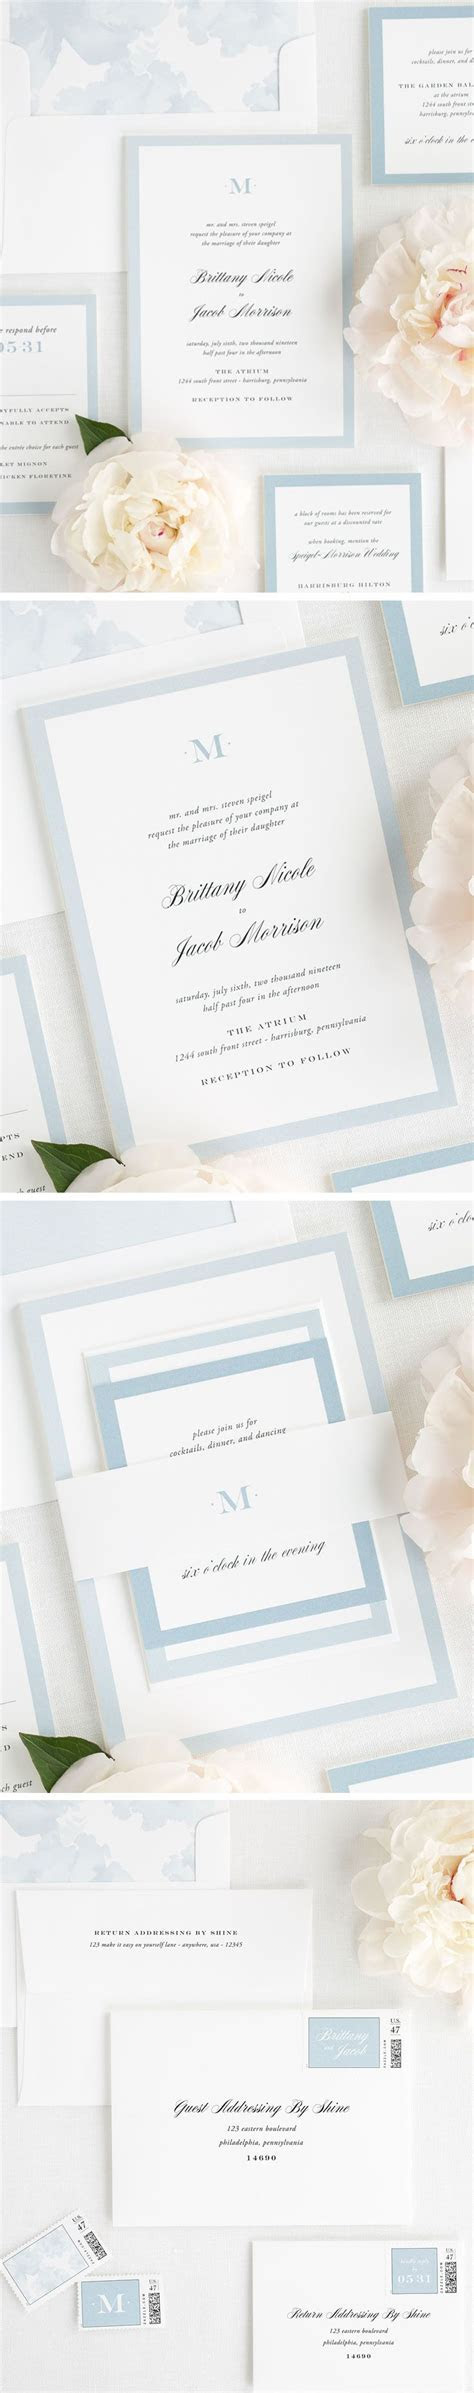 17 Best ideas about Wedding Monograms on Pinterest